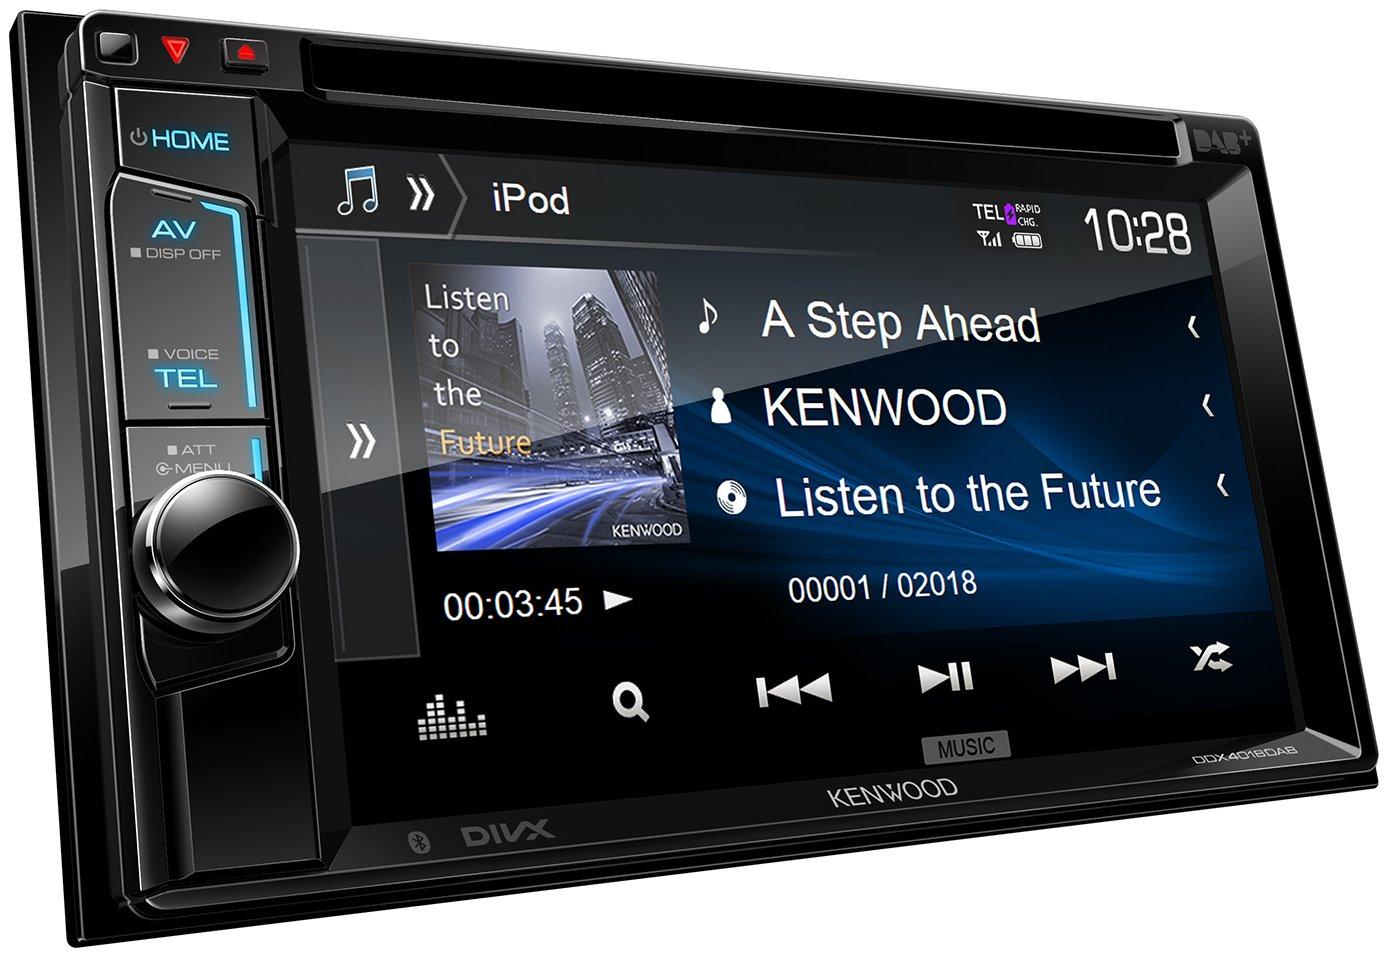 Kenwood-DDX4018DAB-157-cm-Doppel-DIN-VGA-Monitor-mit-Bluetooth-Modul-und-Digitalradio-schwarz